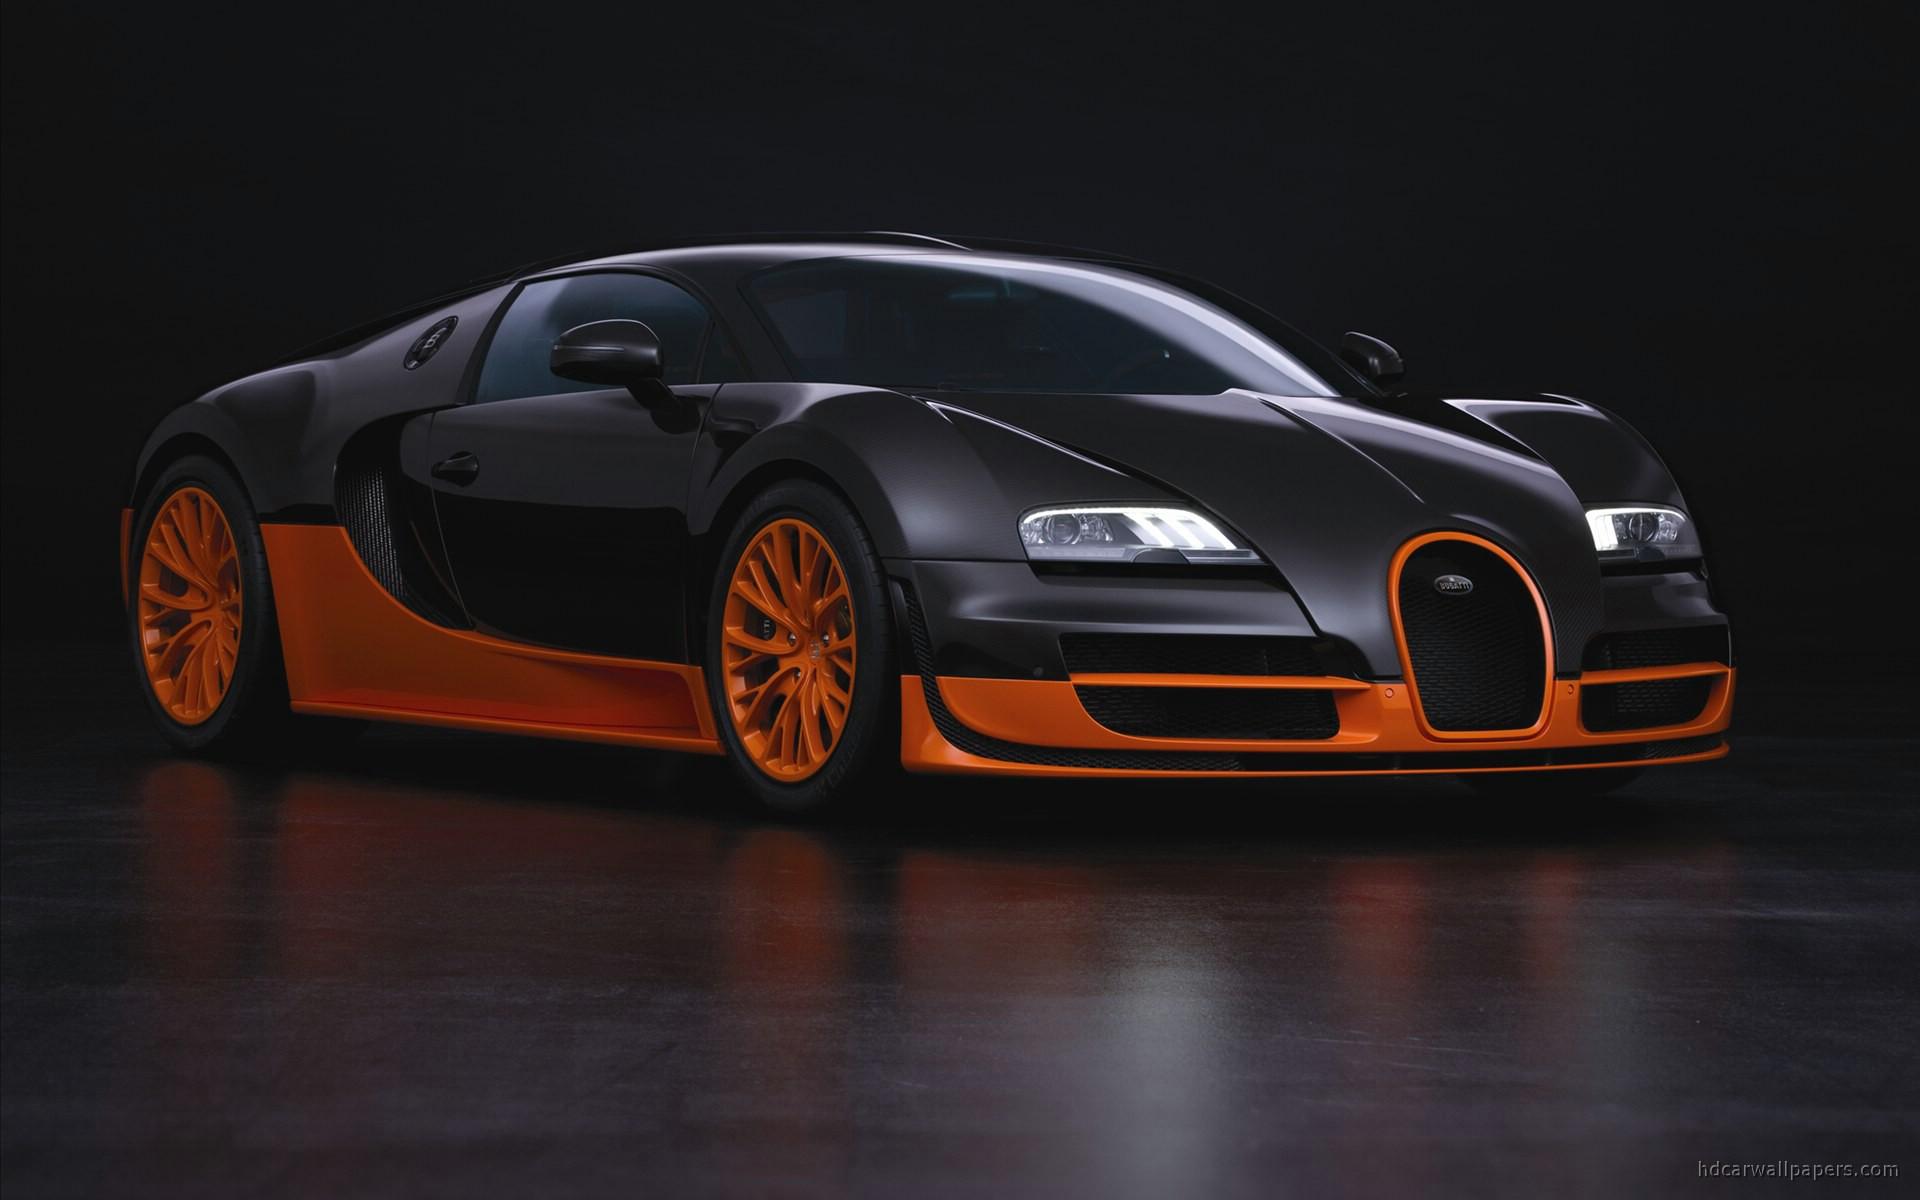 Bugatti Veyron Super Sports Car Wallpaper | HD Car Wallpapers